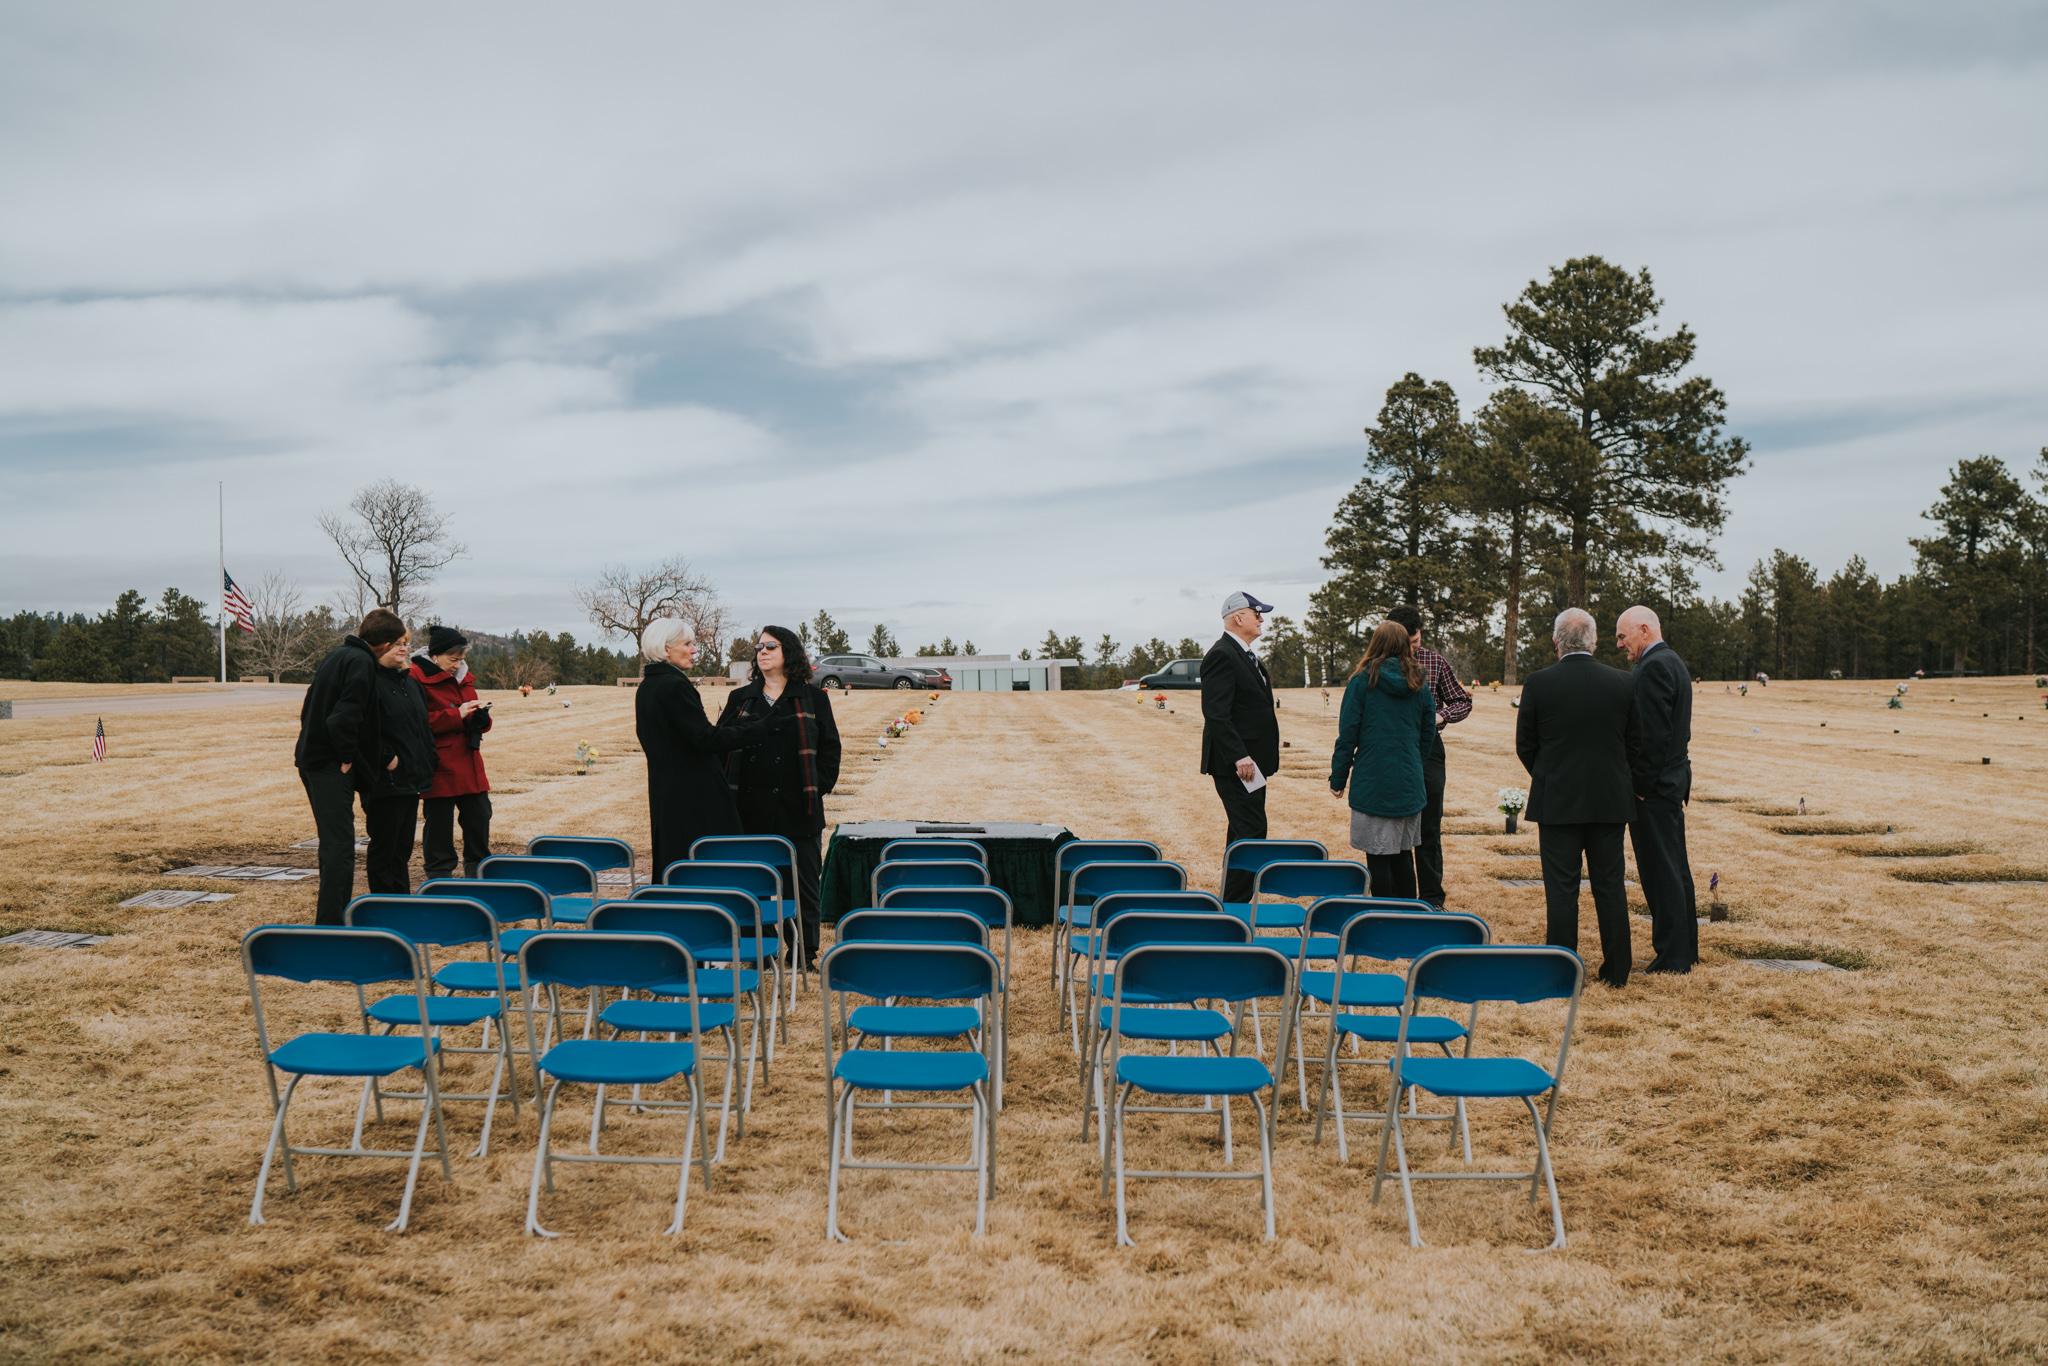 usafa-colorado-military-honours-burial-funeral-photography-grace-elizabeth-colchester-essex-alternative-wedding-lifestyle-photographer (3 of 127).jpg